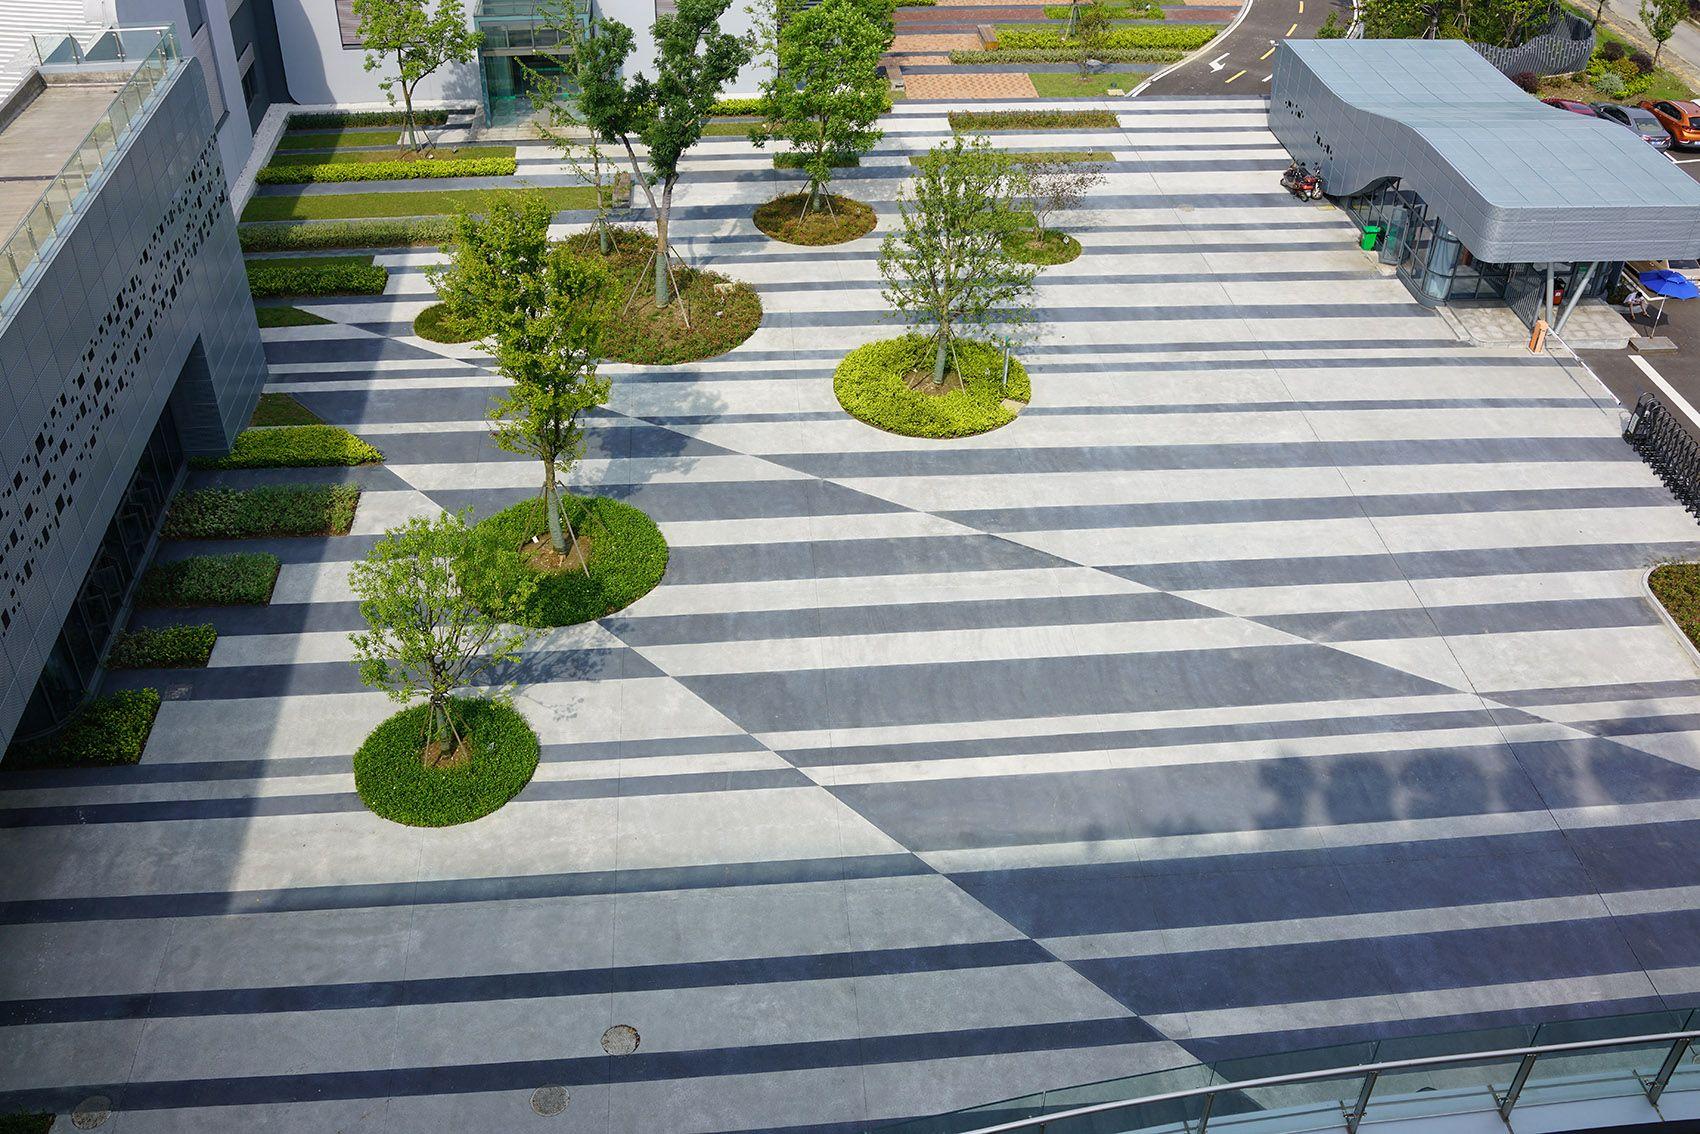 pam - groen plein landscape